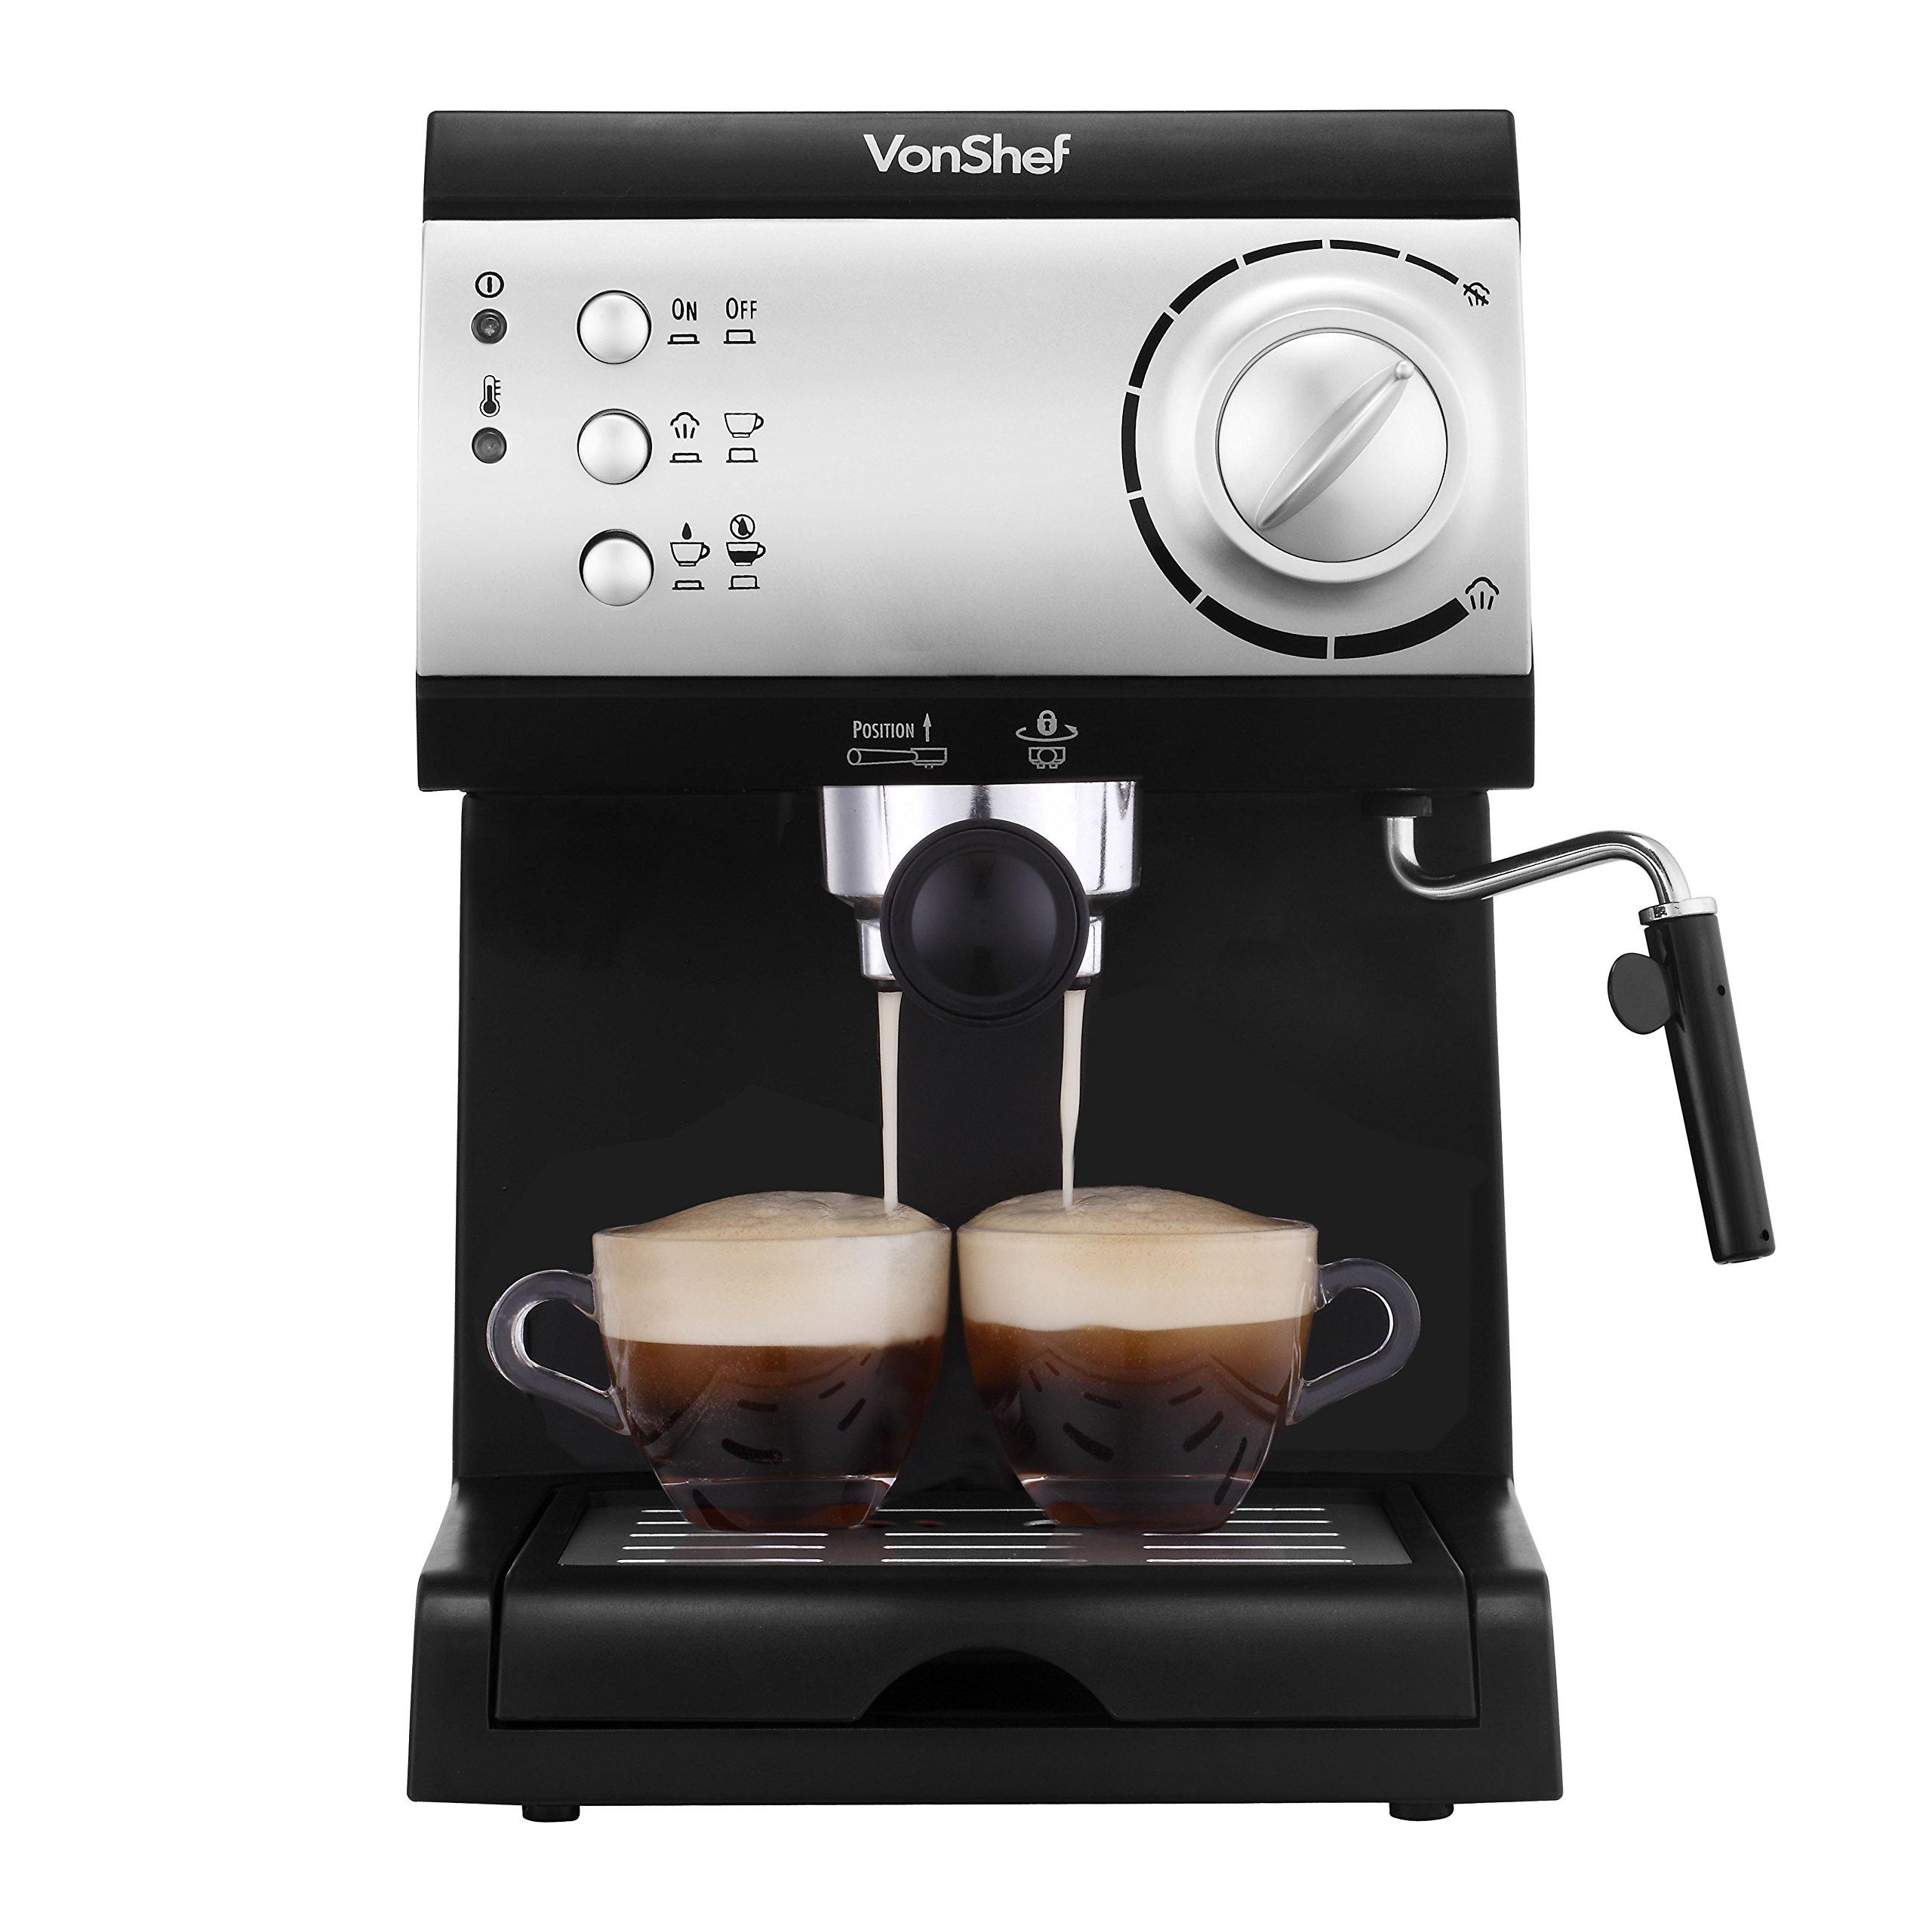 VonShef Electric 15 Bar Automatic Espresso and Cappuccino Coffee Maker Machine by VonShef